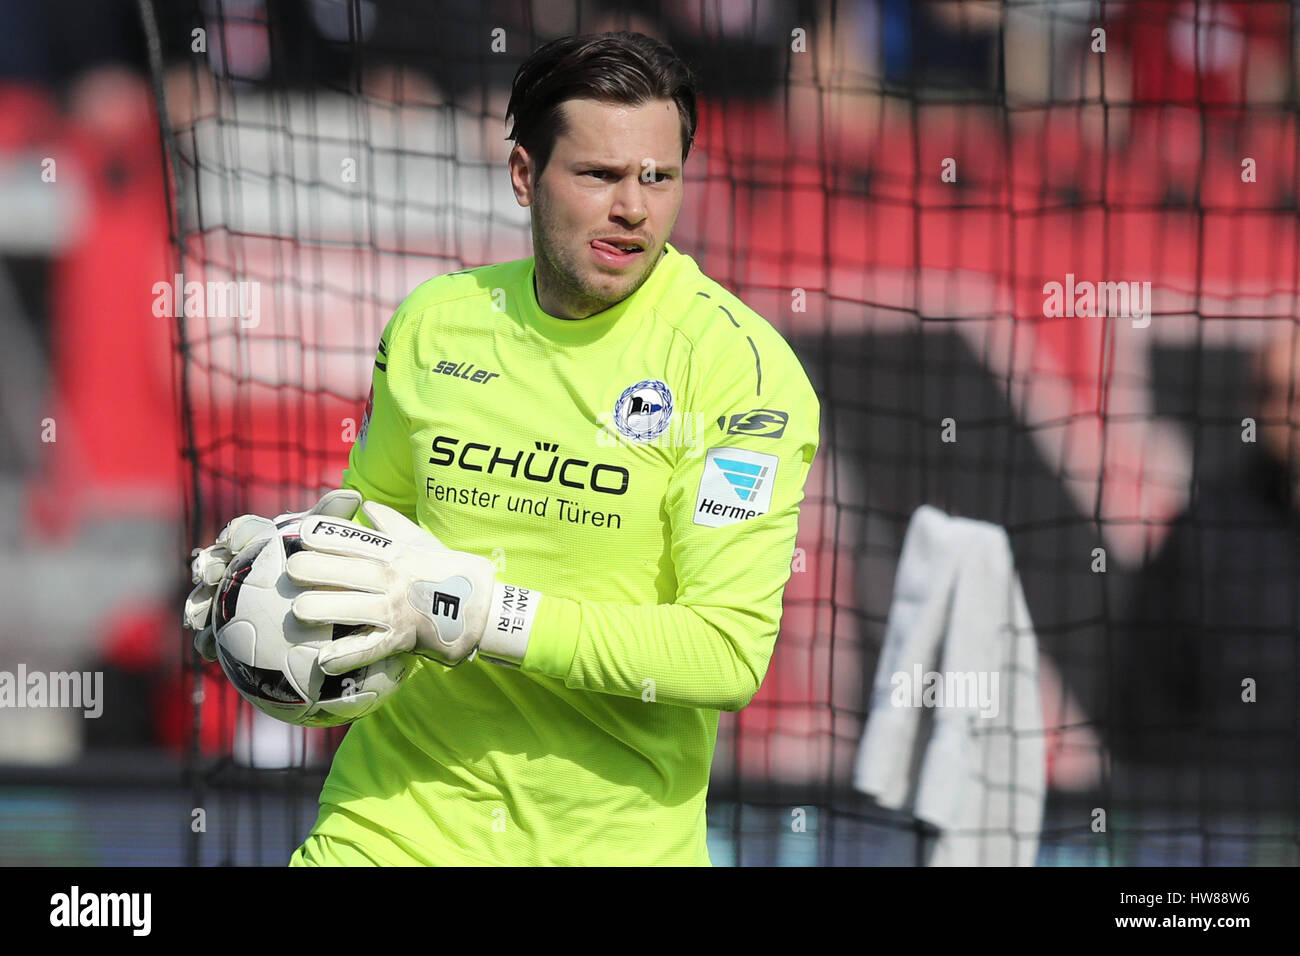 Nuremberg, Germany. 12th Mar, 2017. Bielefeld's goalkeeper Daniel Davari, photographed during the German 2nd - Stock Image